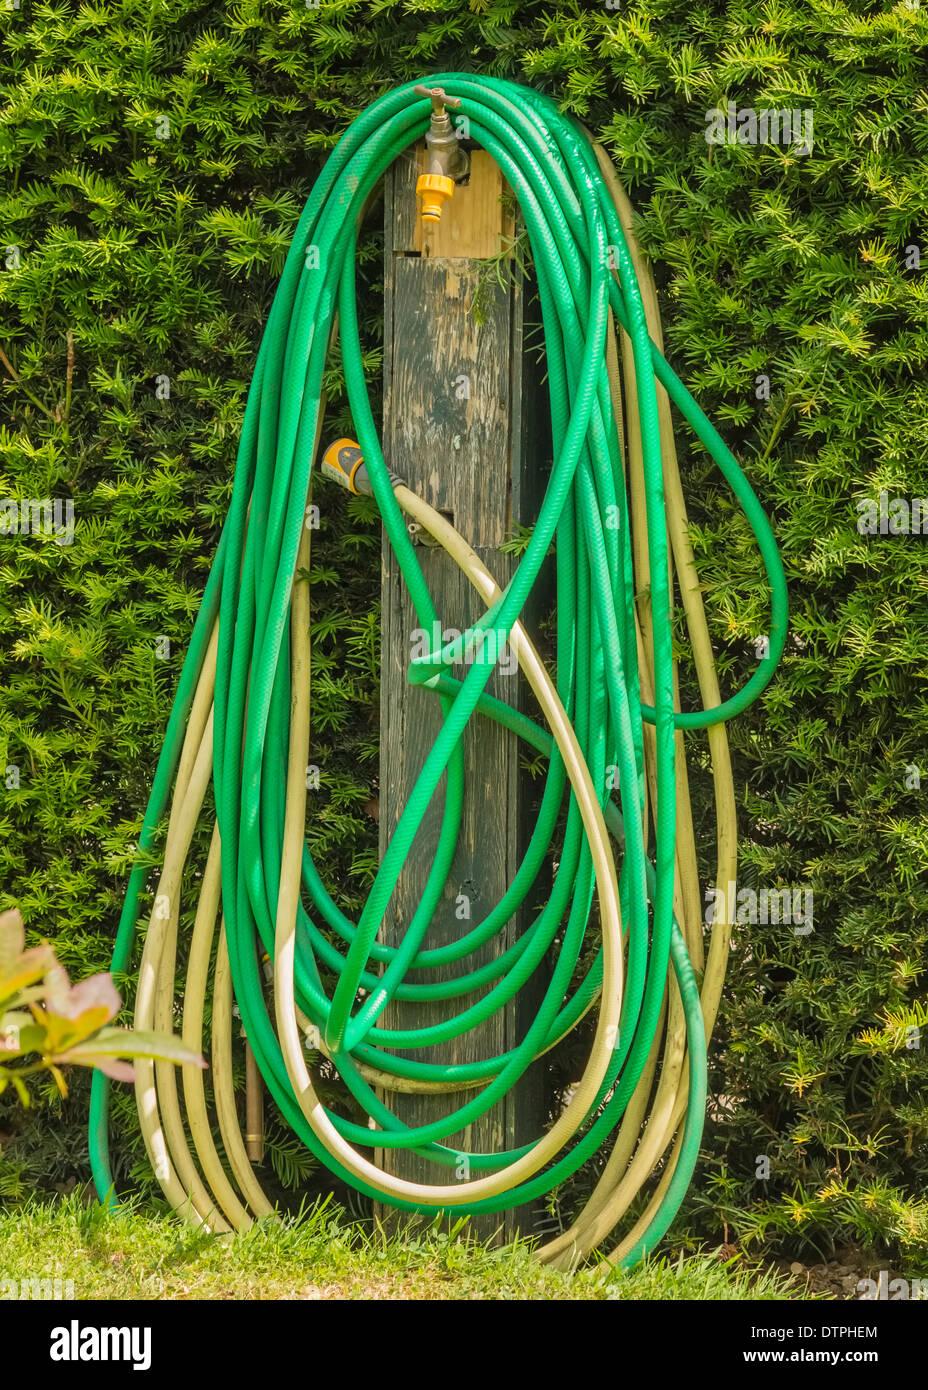 Garden Hose Coiled Around An Outdoor Tap - Stock Image